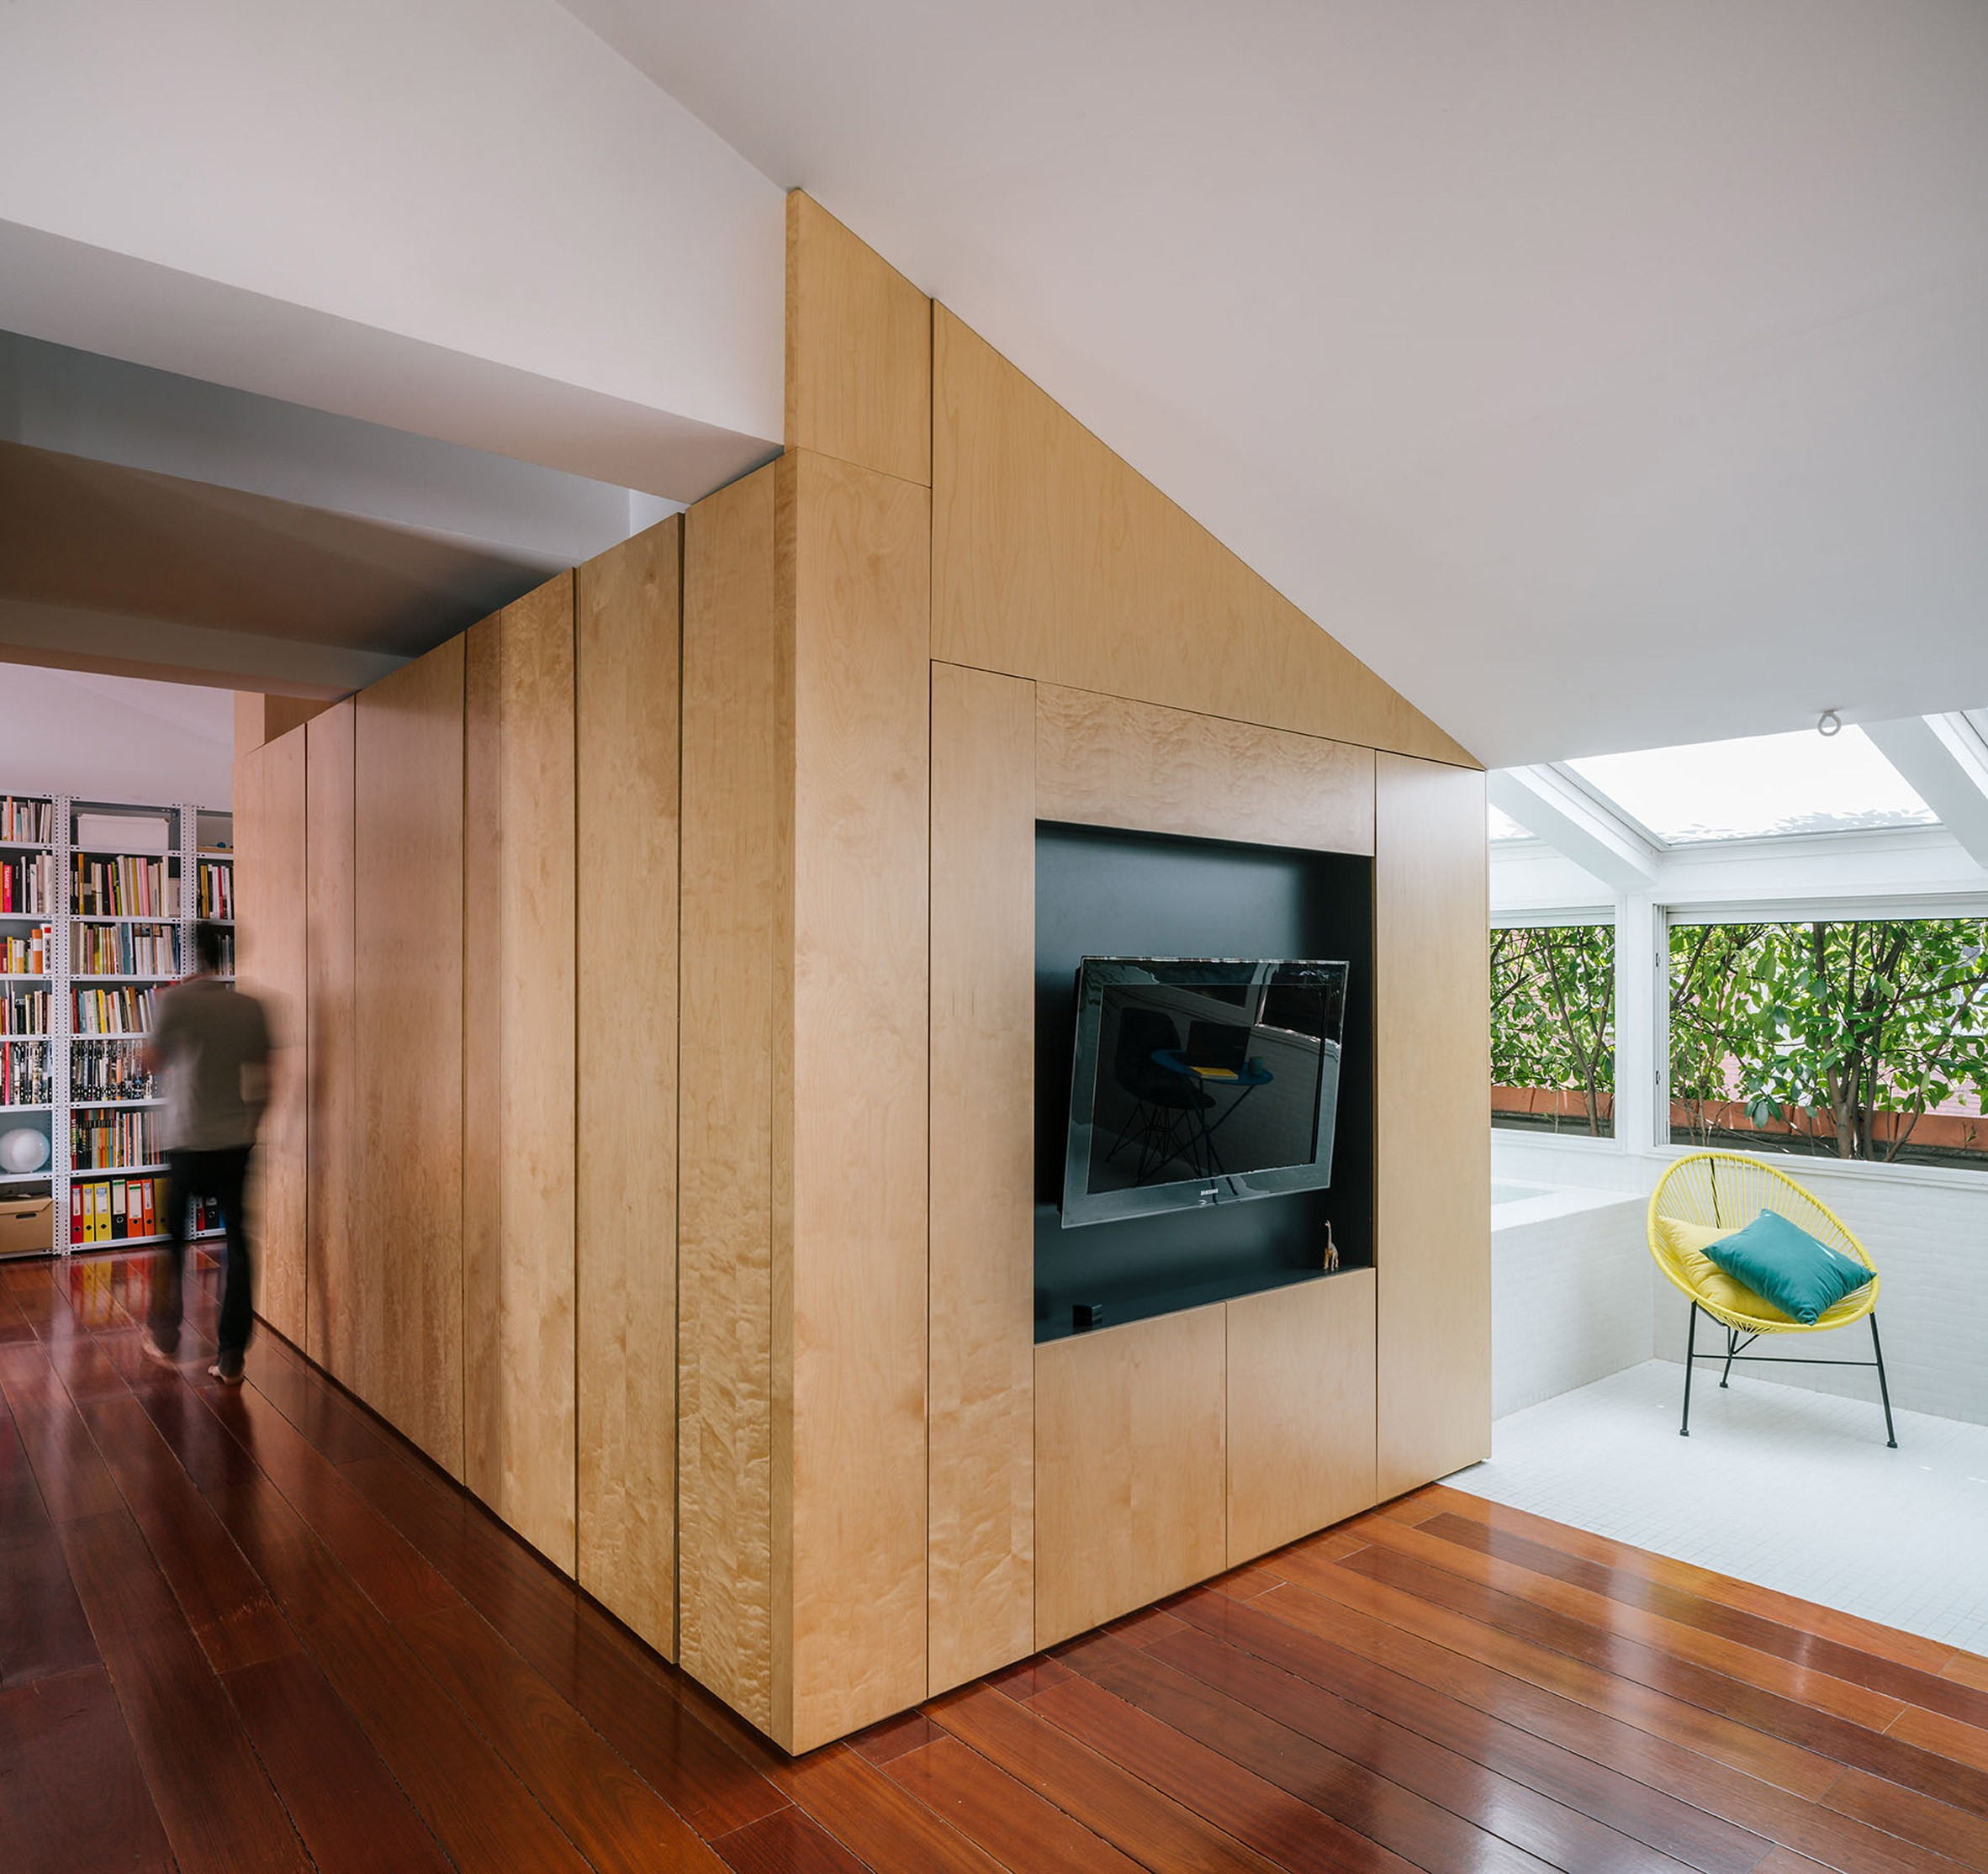 g-house-gon-architects-interiors-dezeen-2364-col-26-4uMbB.jpg